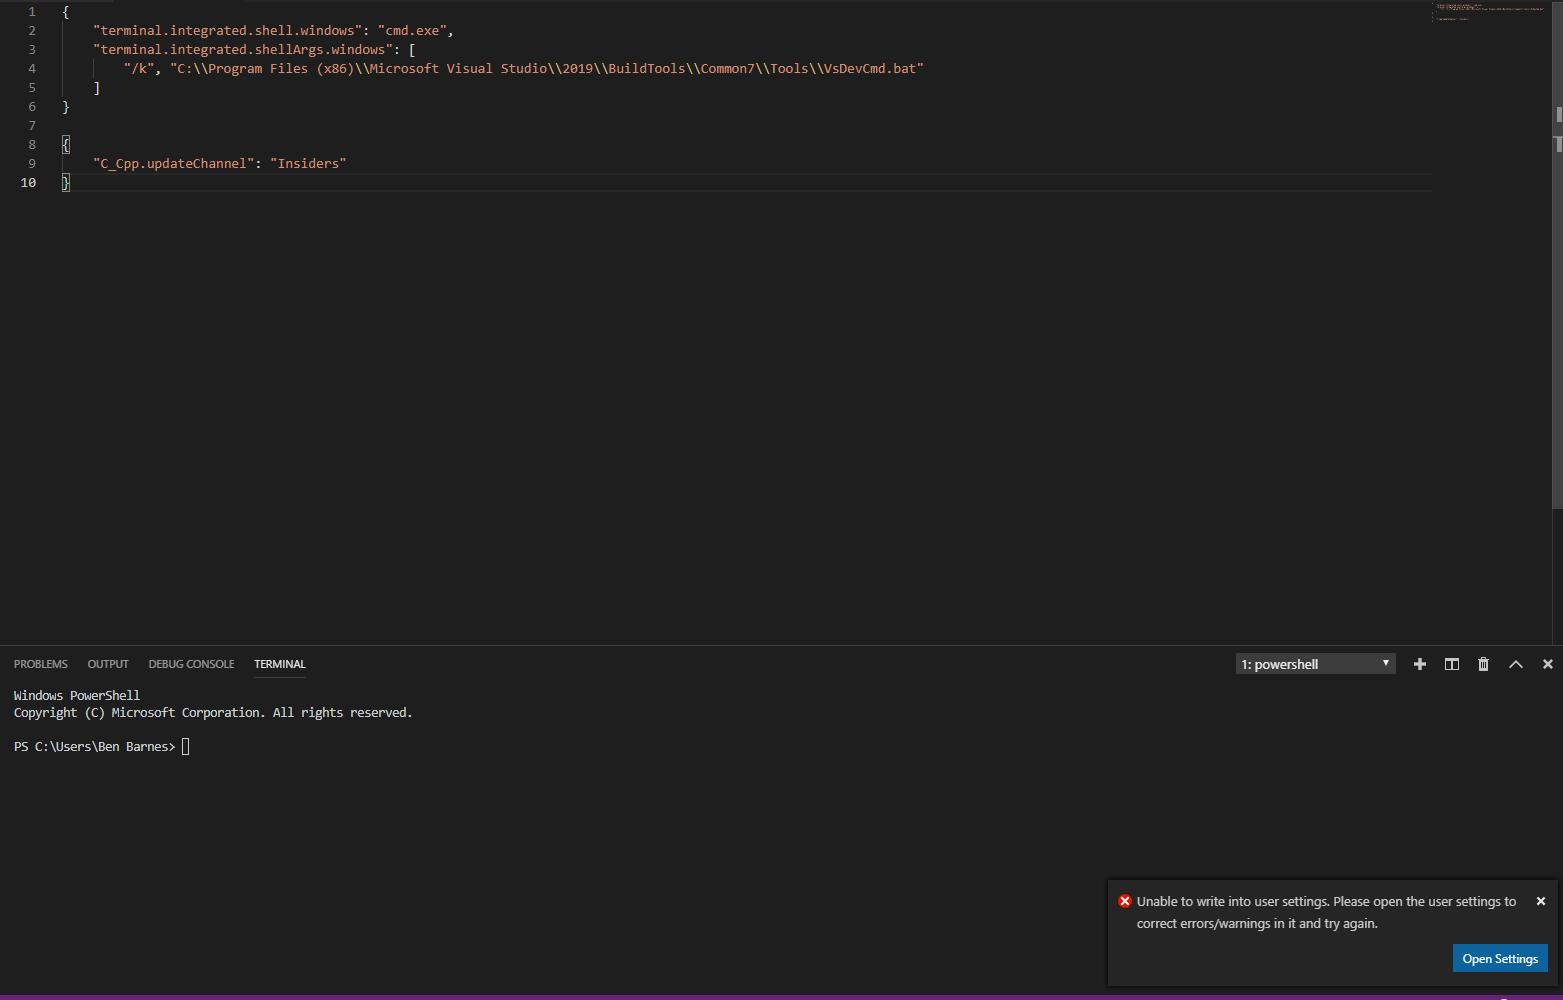 Visual Studio Code: Terminal staying Powershell instead of